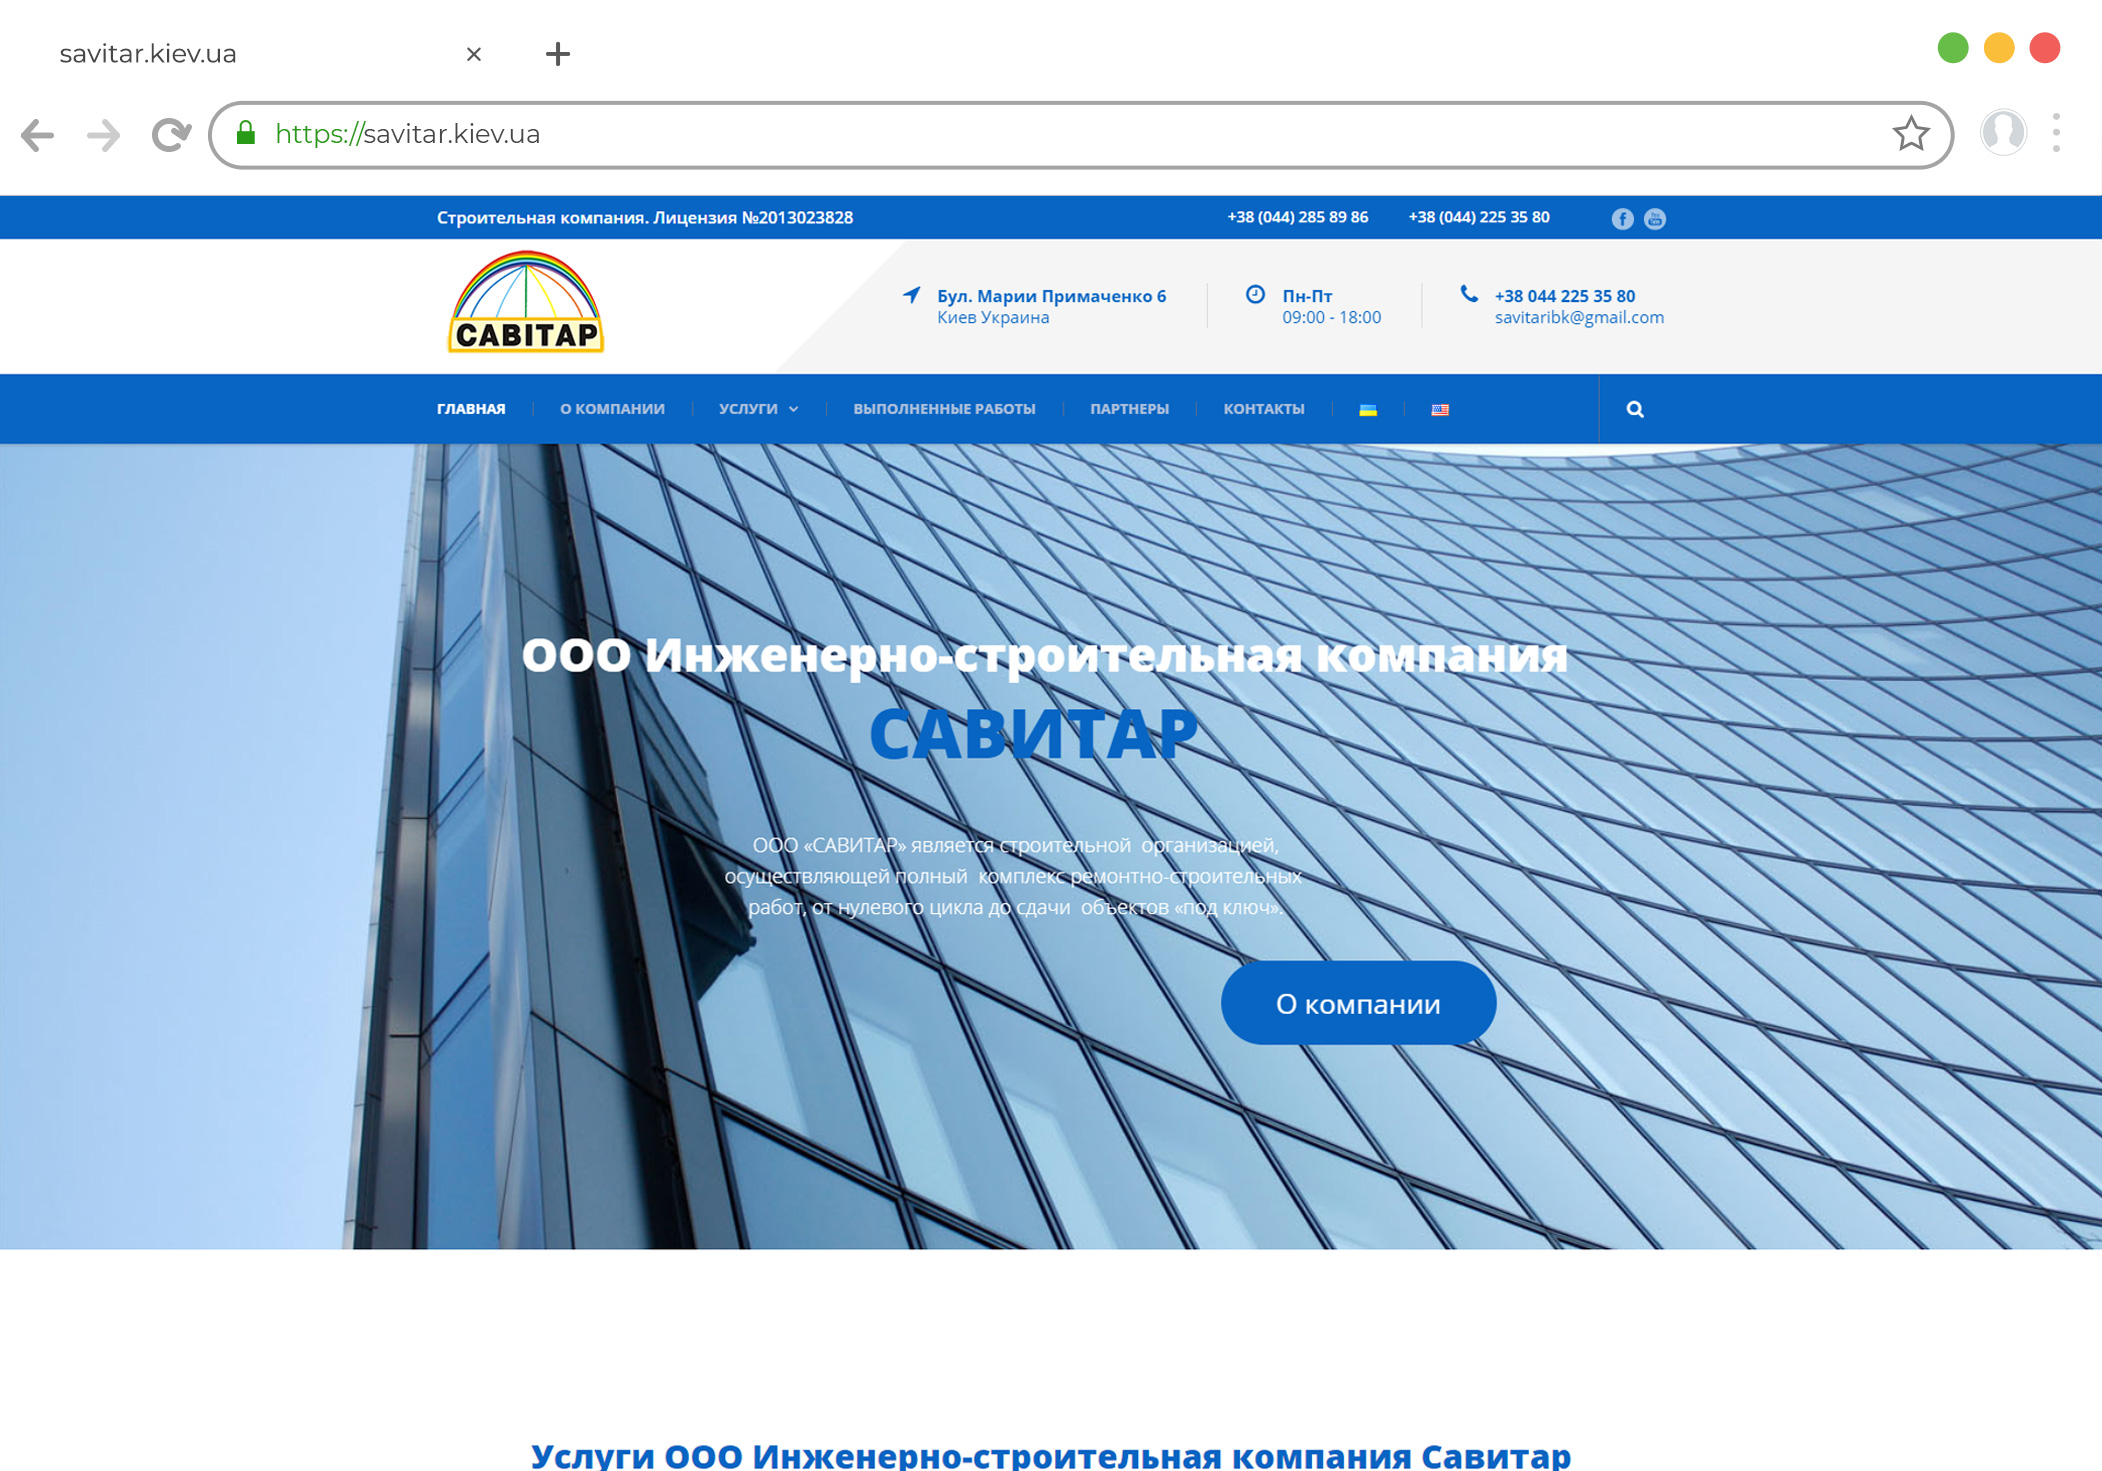 Разработка корпоративного сайта на Wordpress строительной компании savitar.kiev.ua